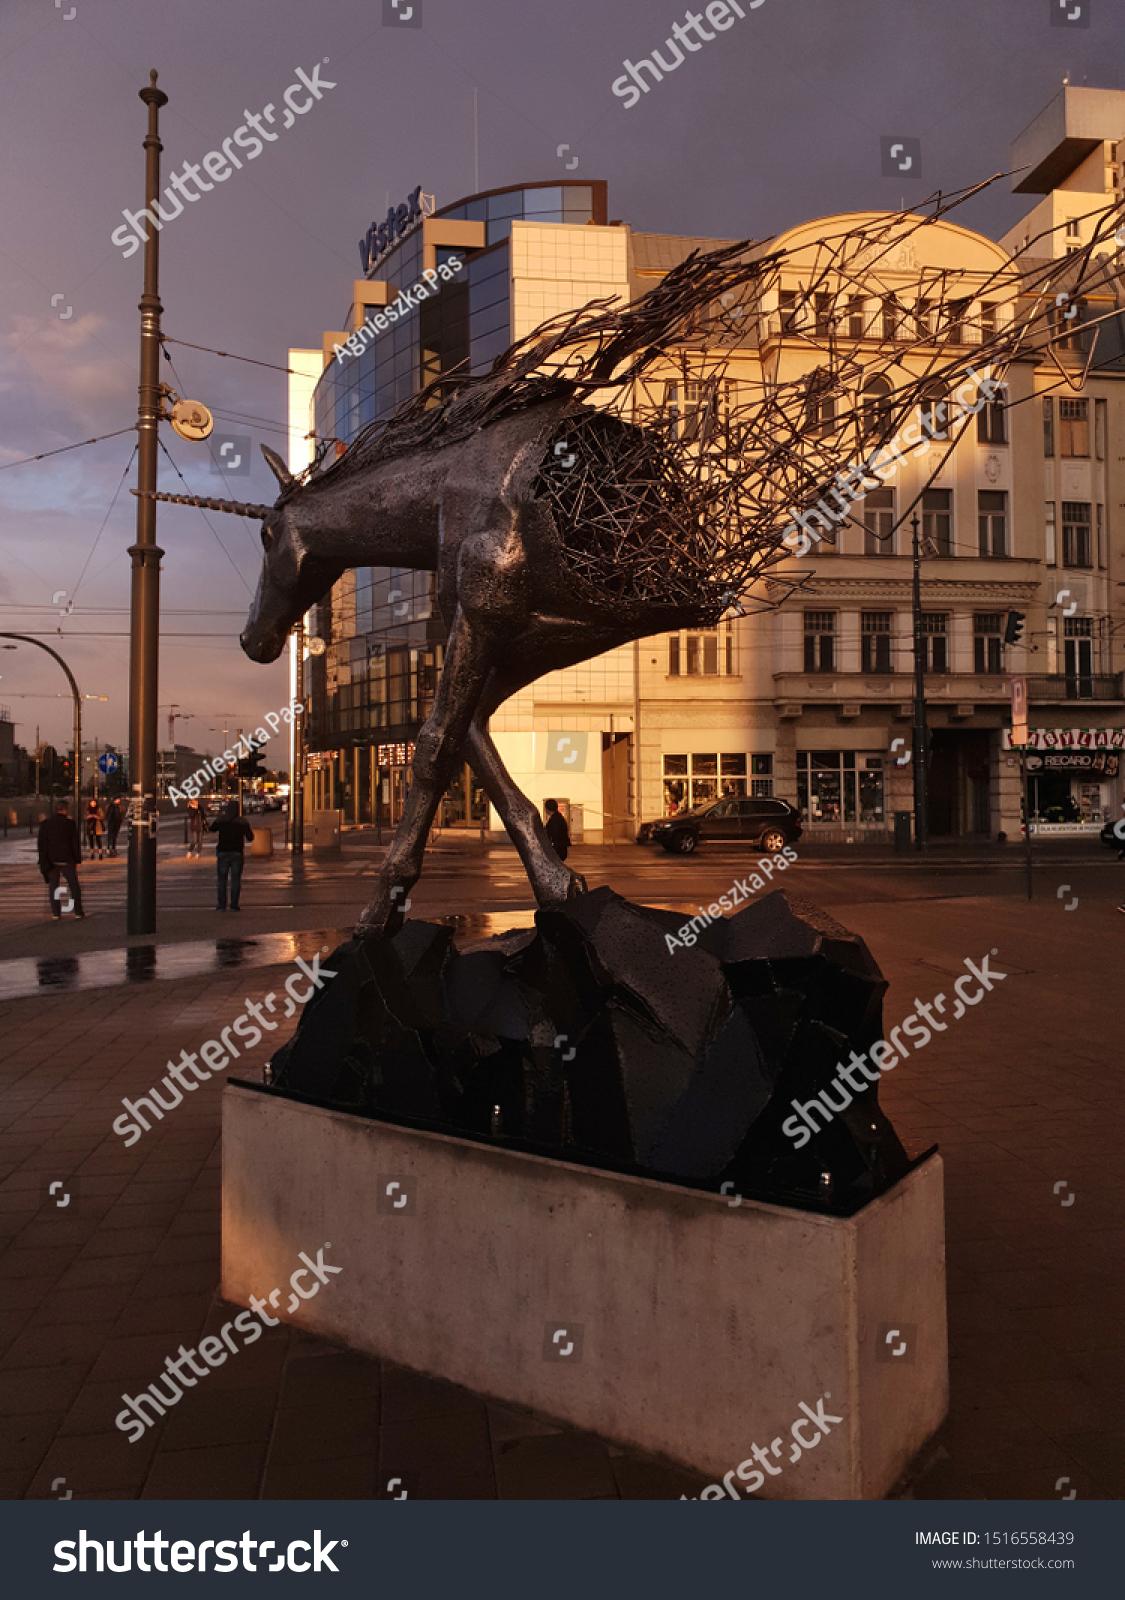 stock-photo-lodz-poland-september-a-scul